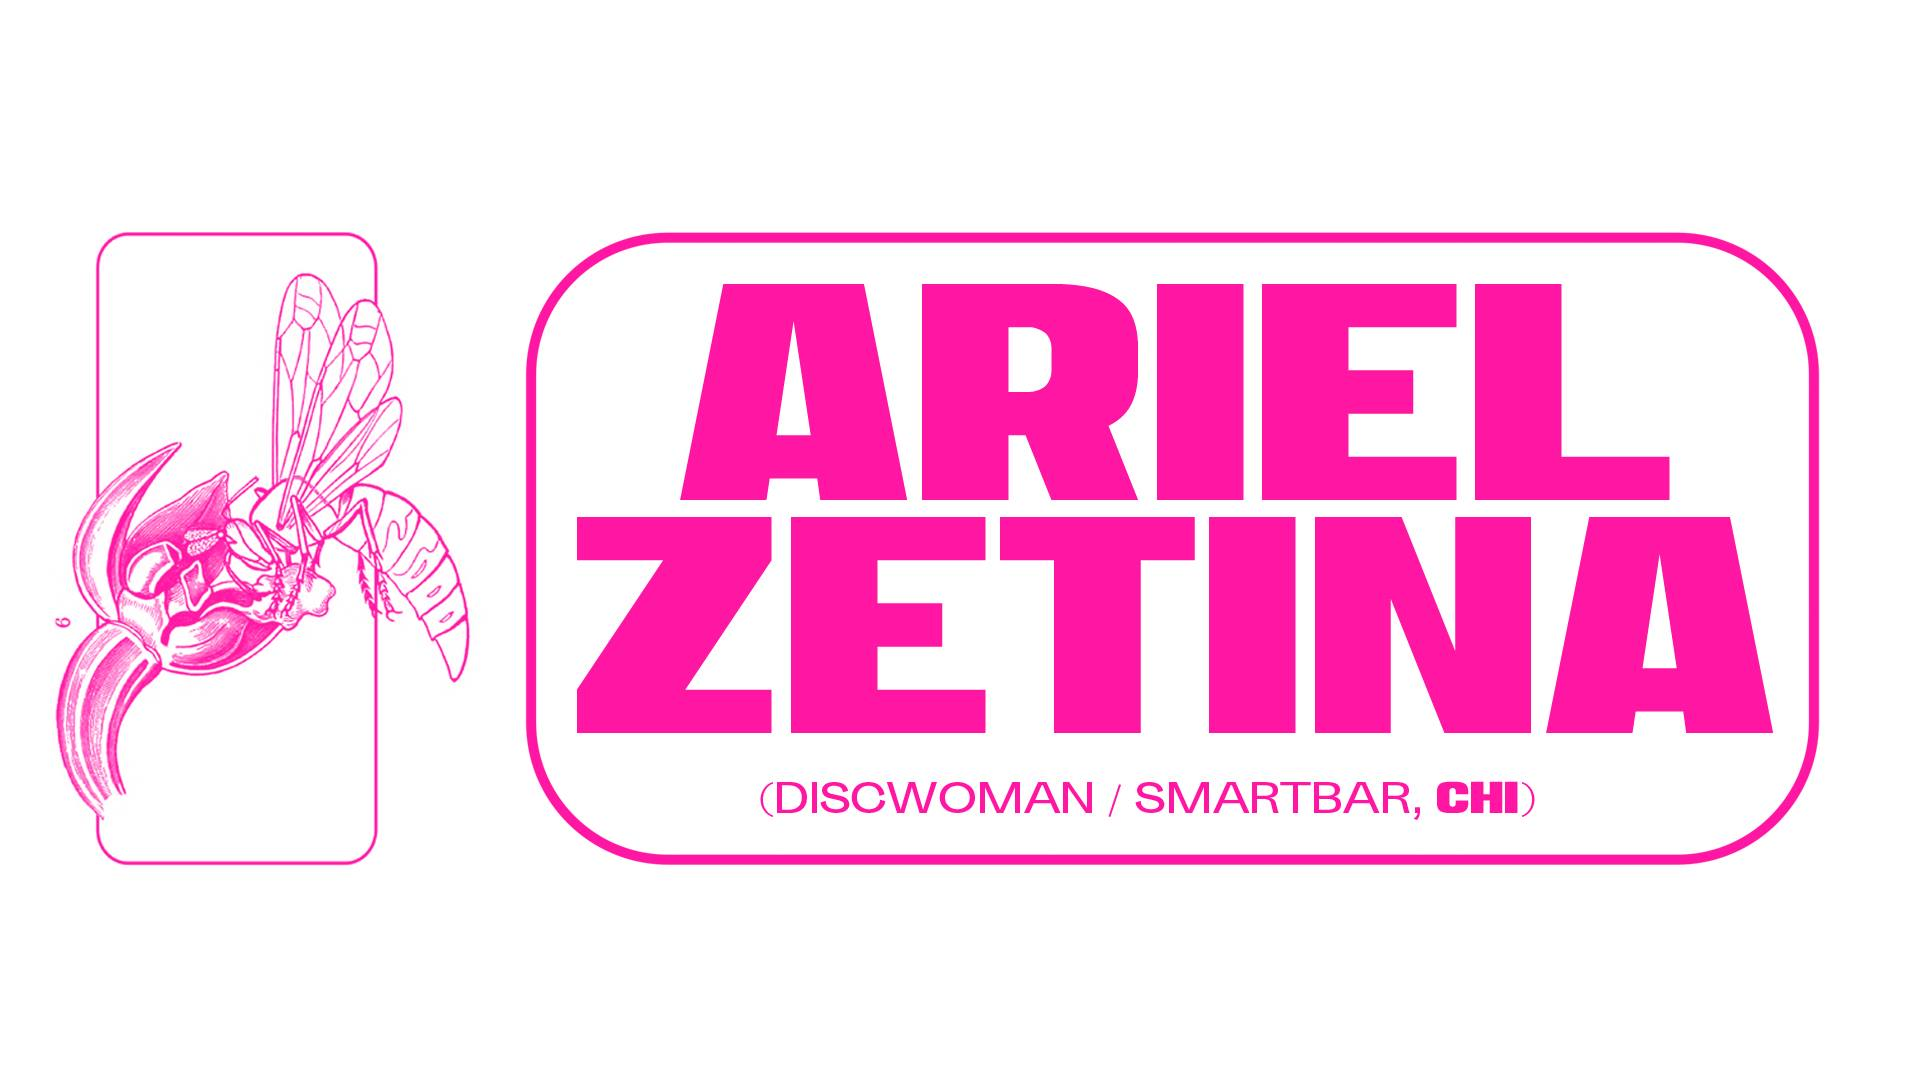 UPCOMING: Mutualism Presents Ariel Zetina (Discwoman/Smartbar) – May 31st 2019